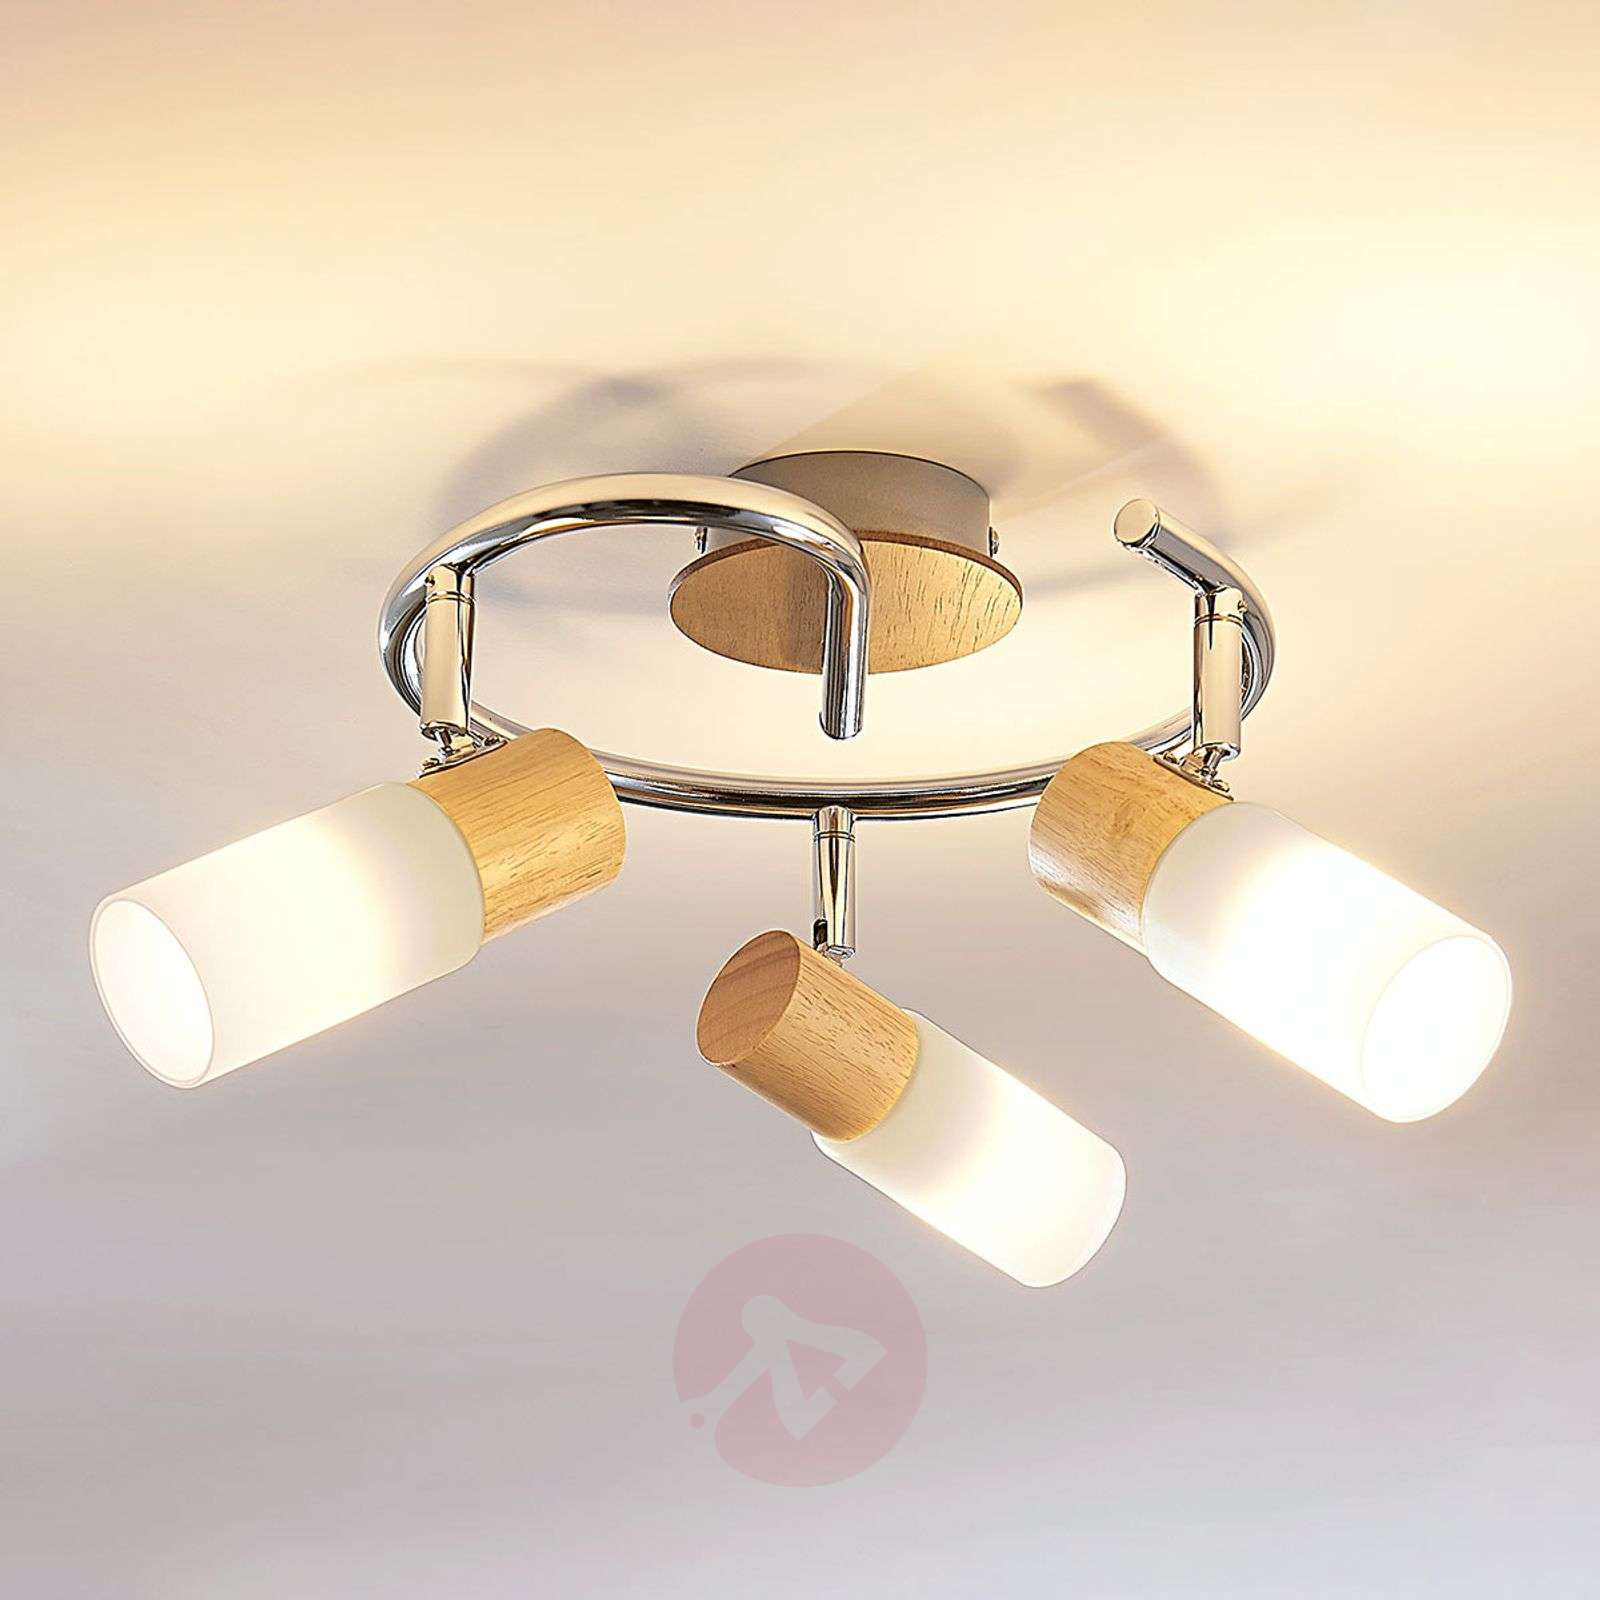 Spottiplafondi Christoph, puuta, E14 LED-9621826-012